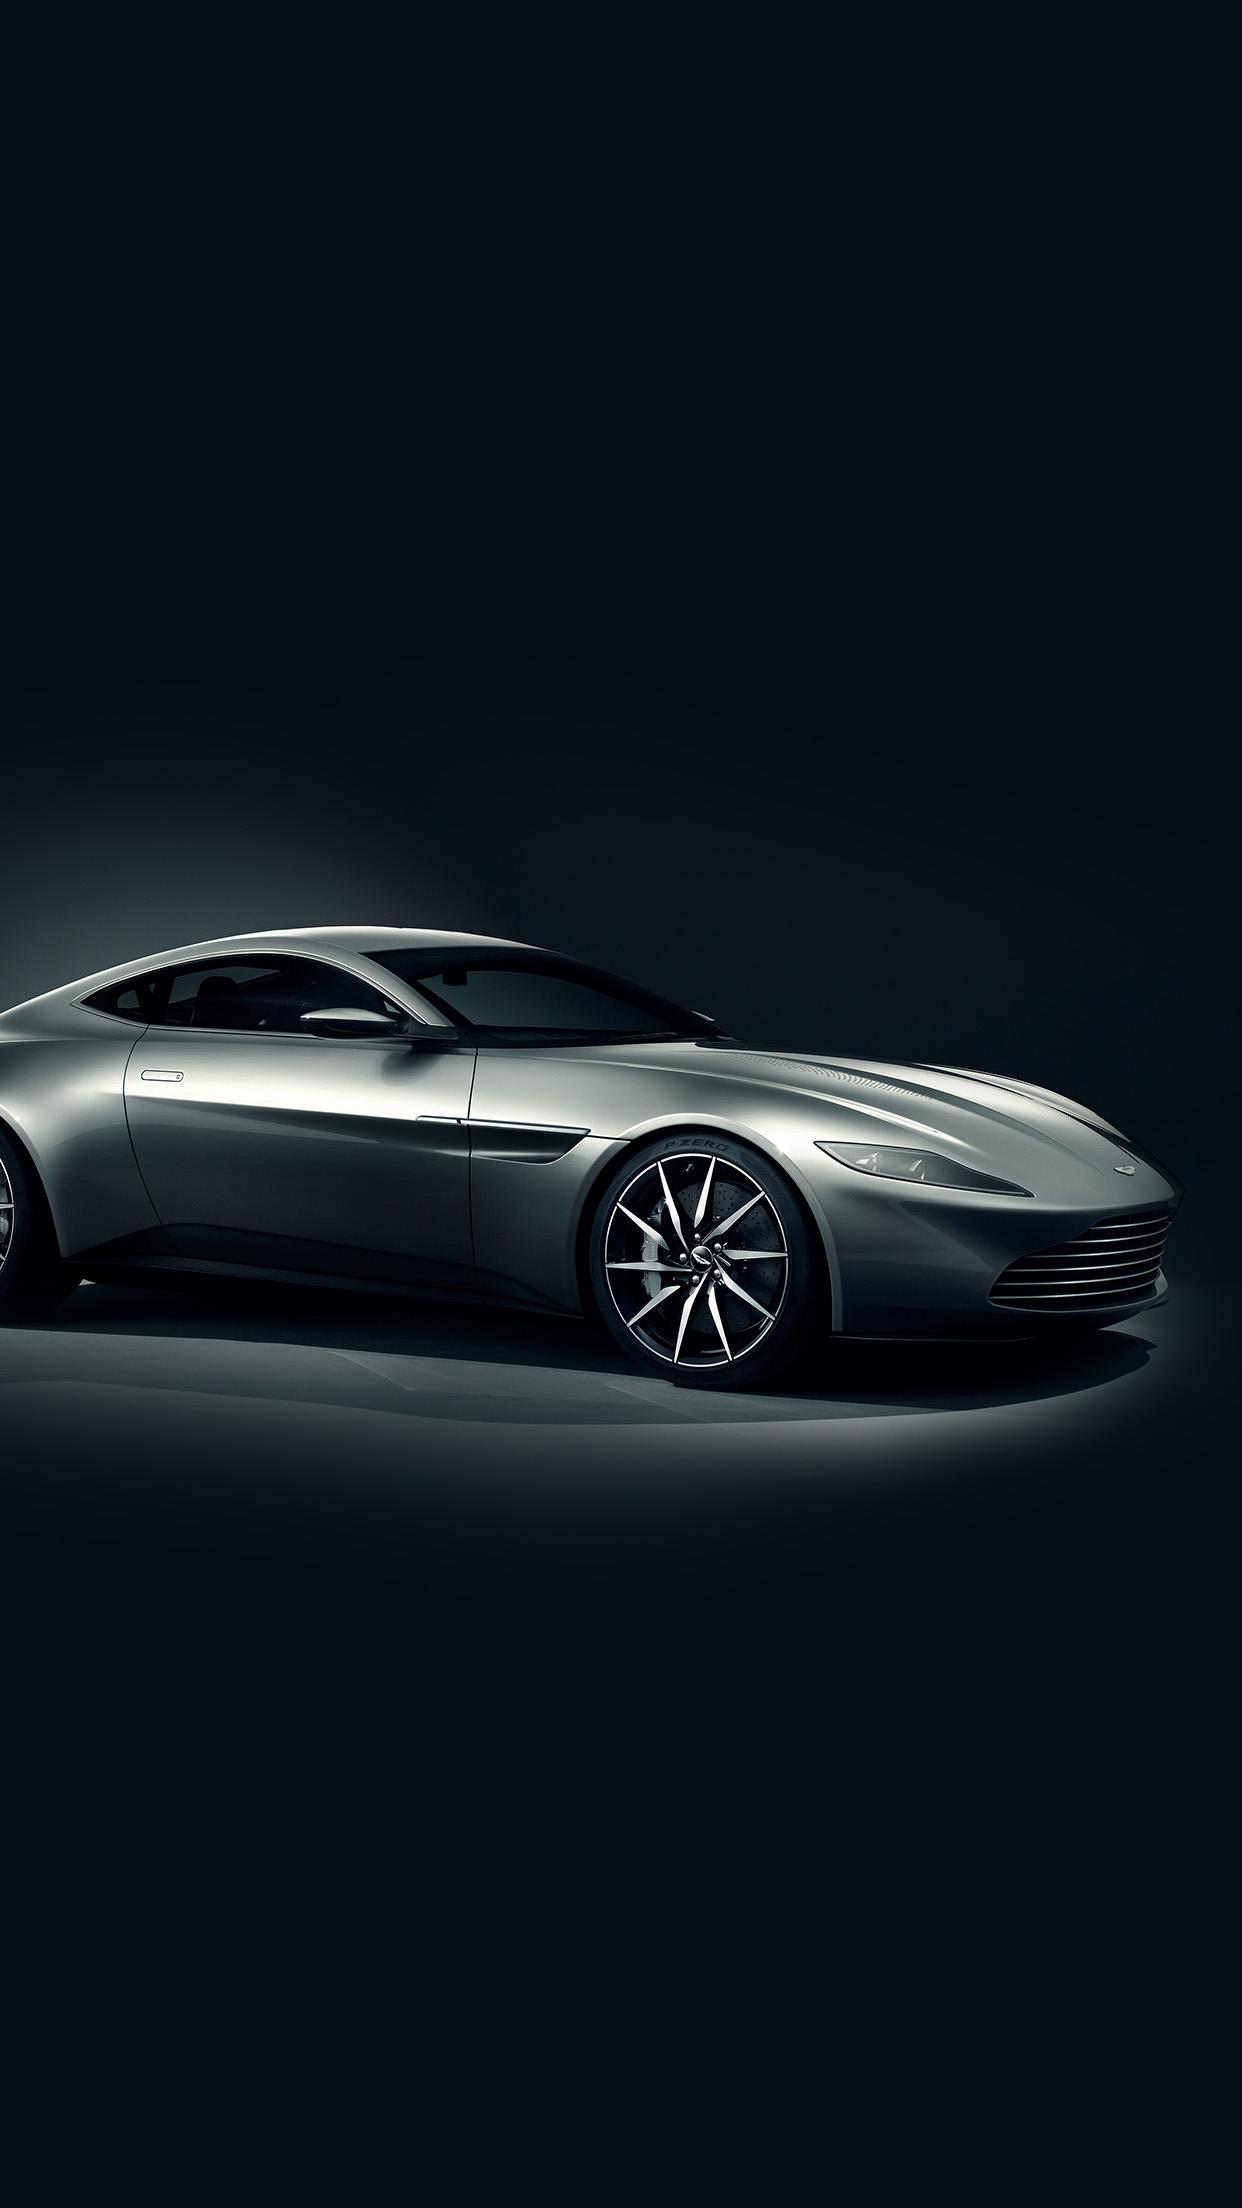 Iphonexpapers Ao57 Aston Martin Db10 Sports Car Exotic Dark